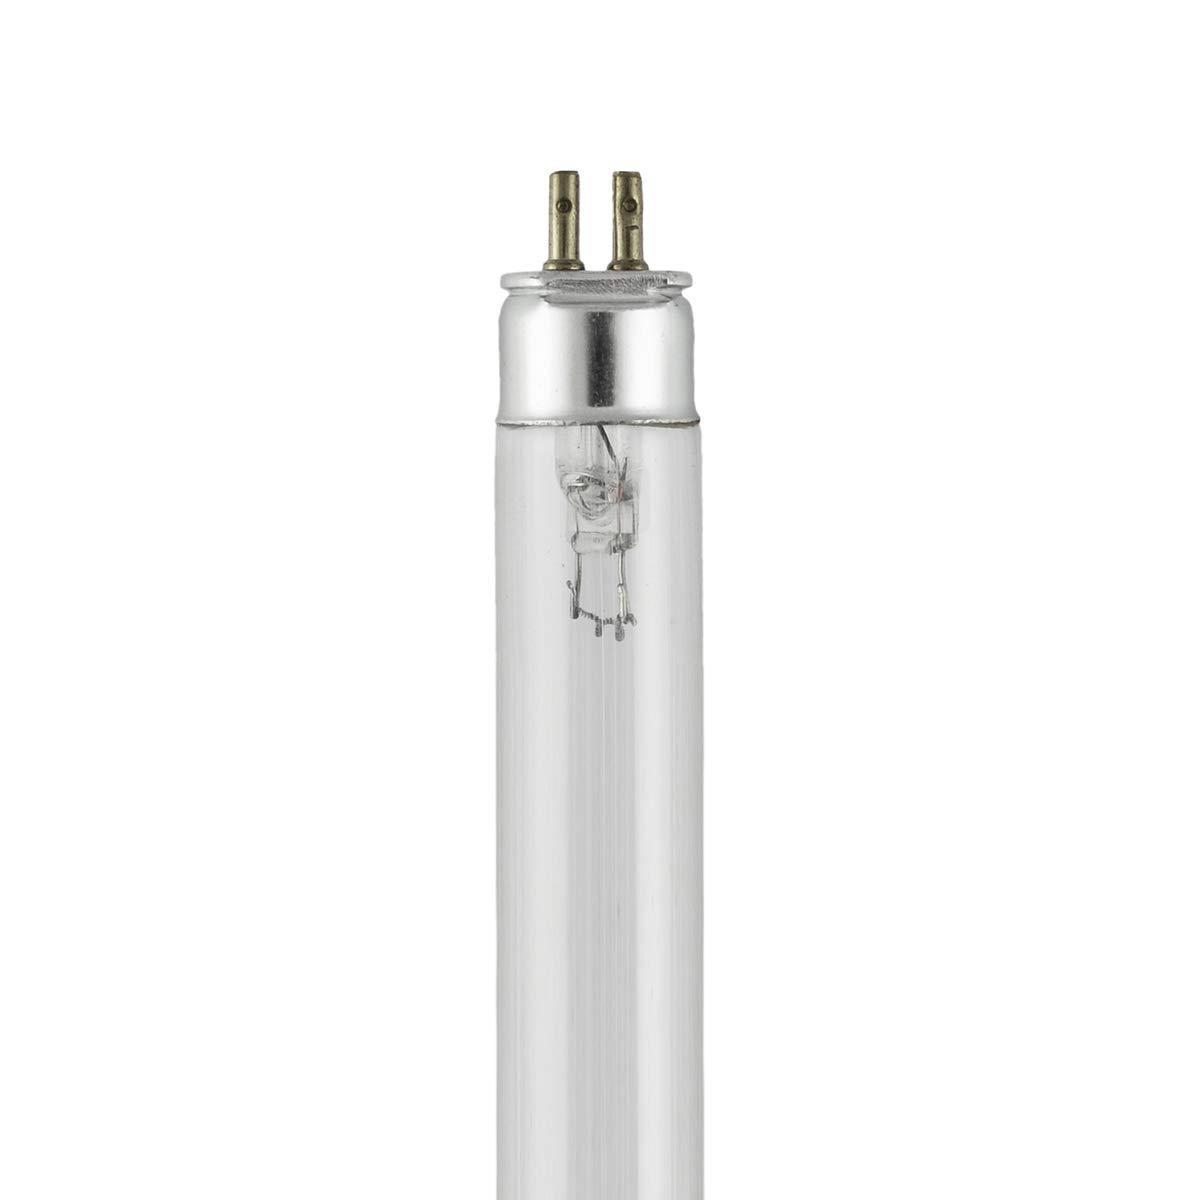 G6T5 6 Watt Germicidal Tube Watts 6W Type T5 Germicidal UV Bulb